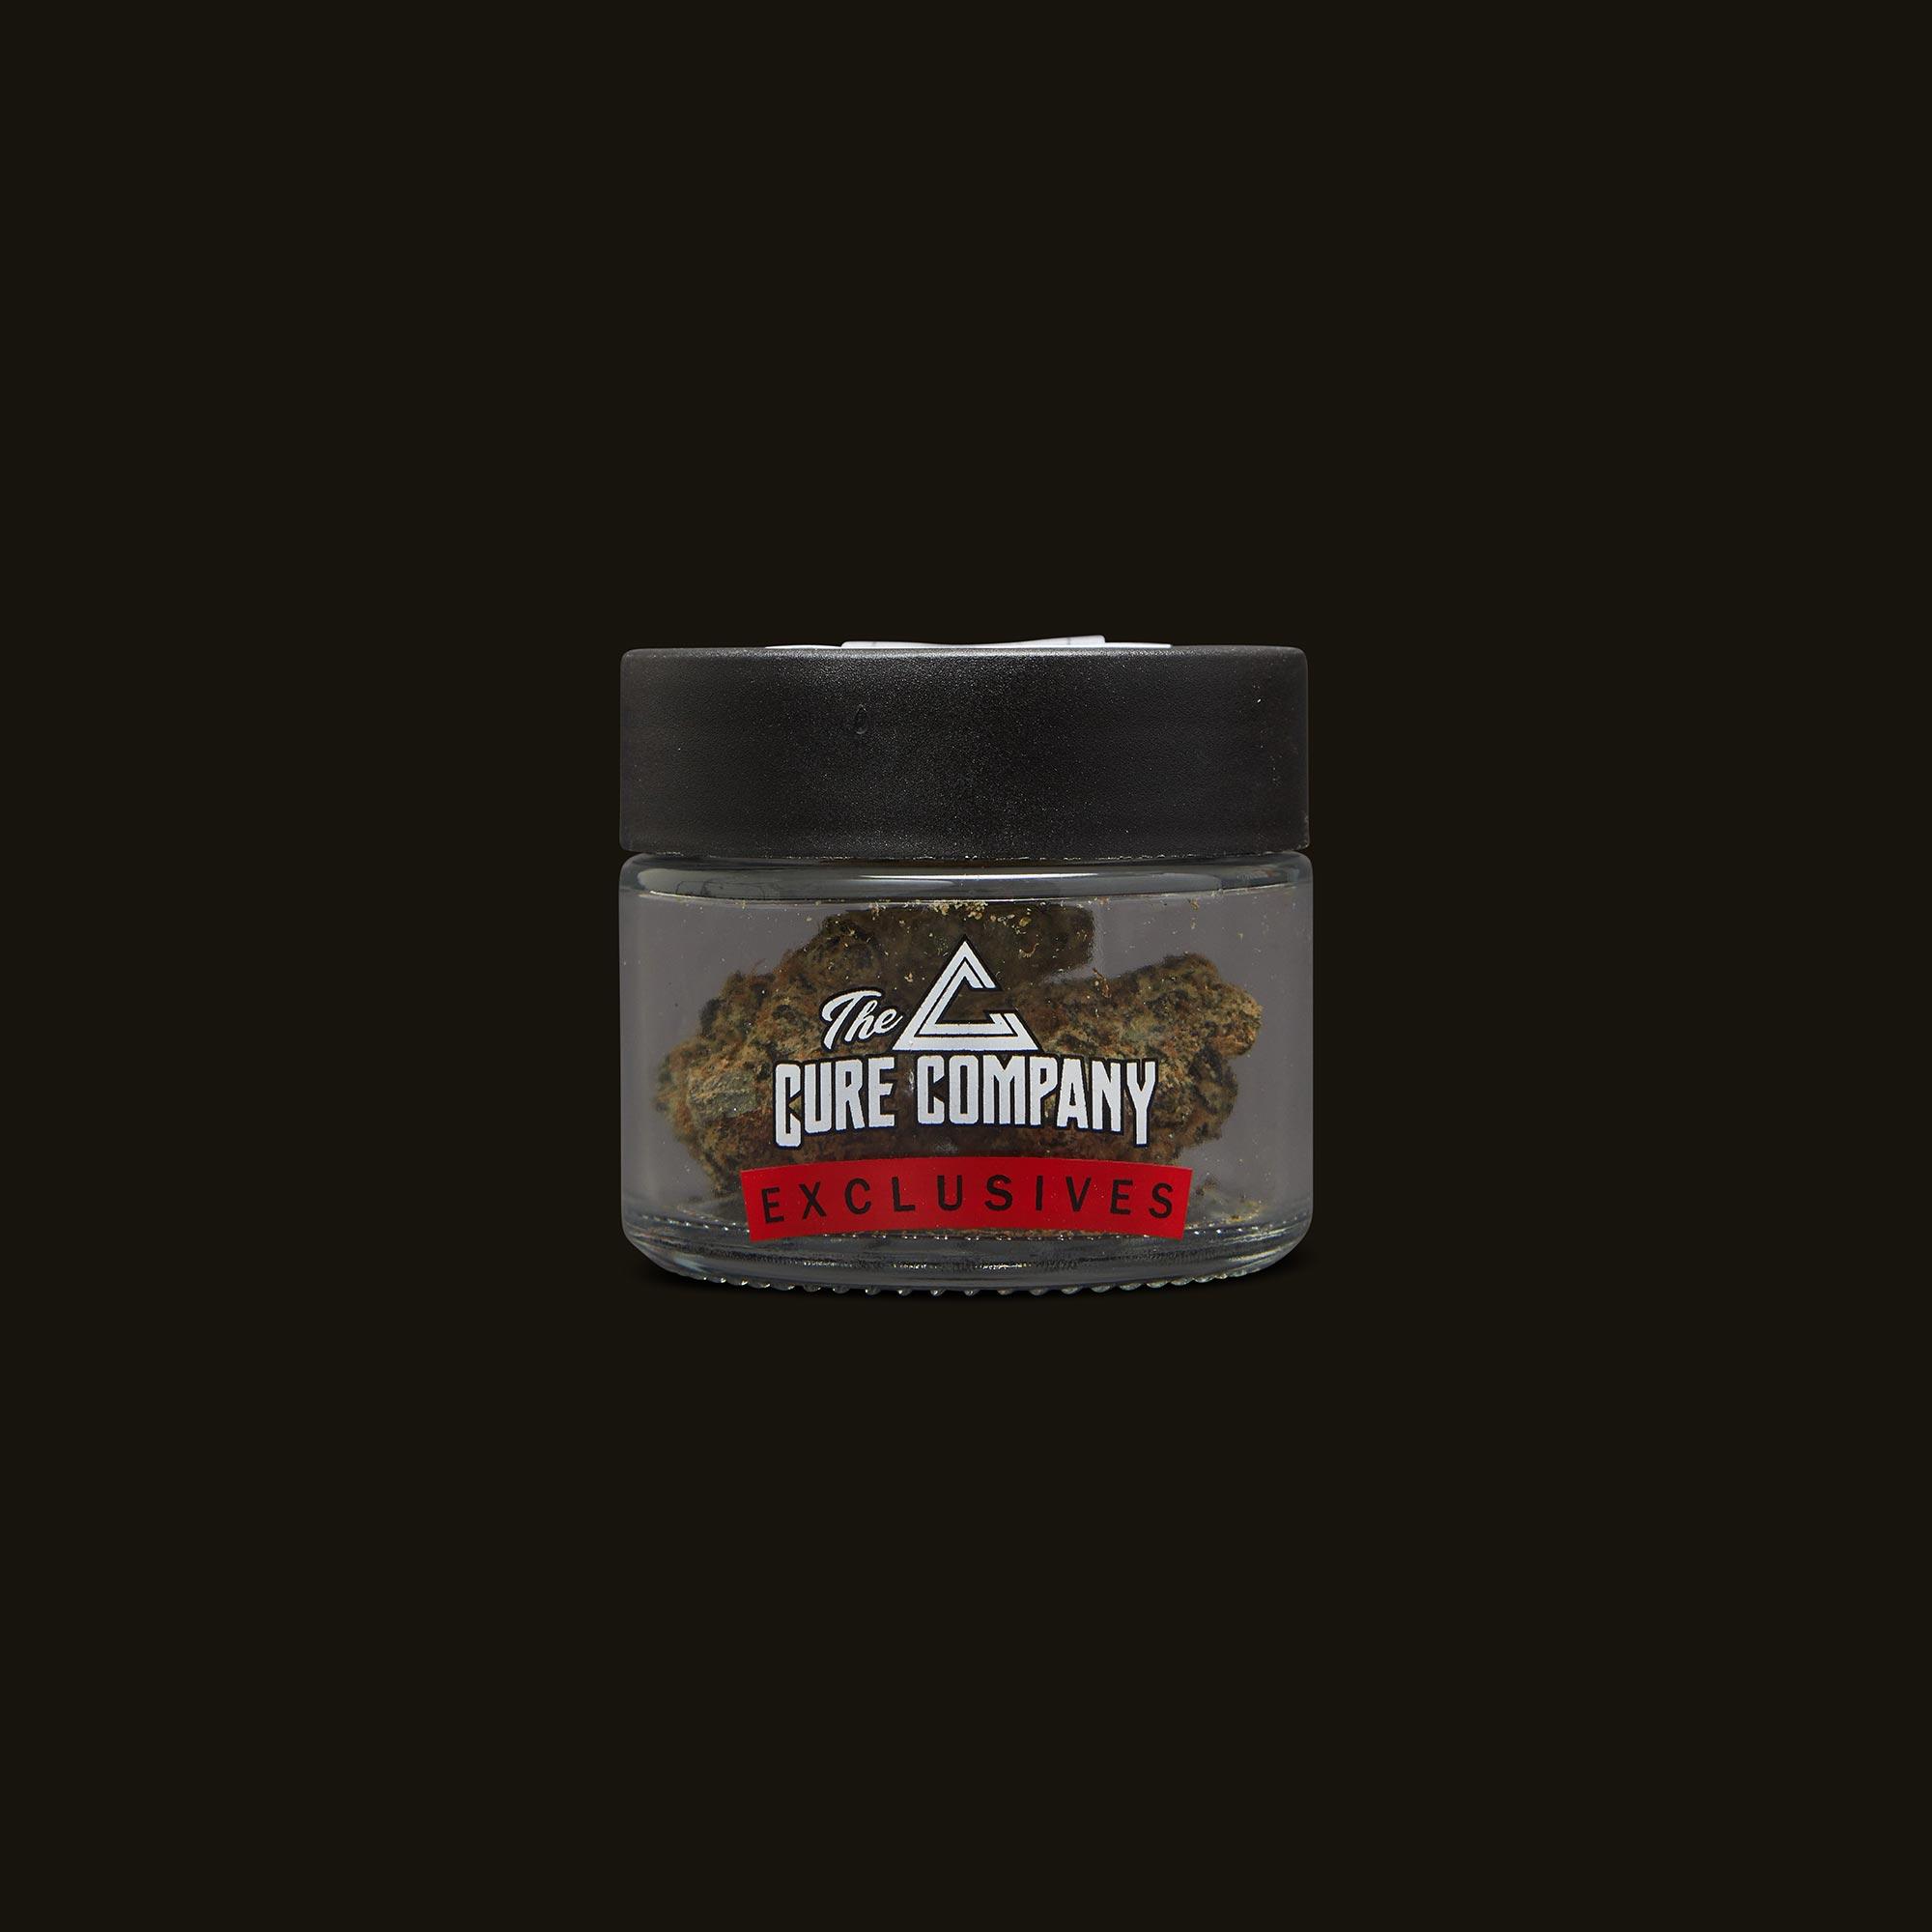 The Cure Company Curelato Jar